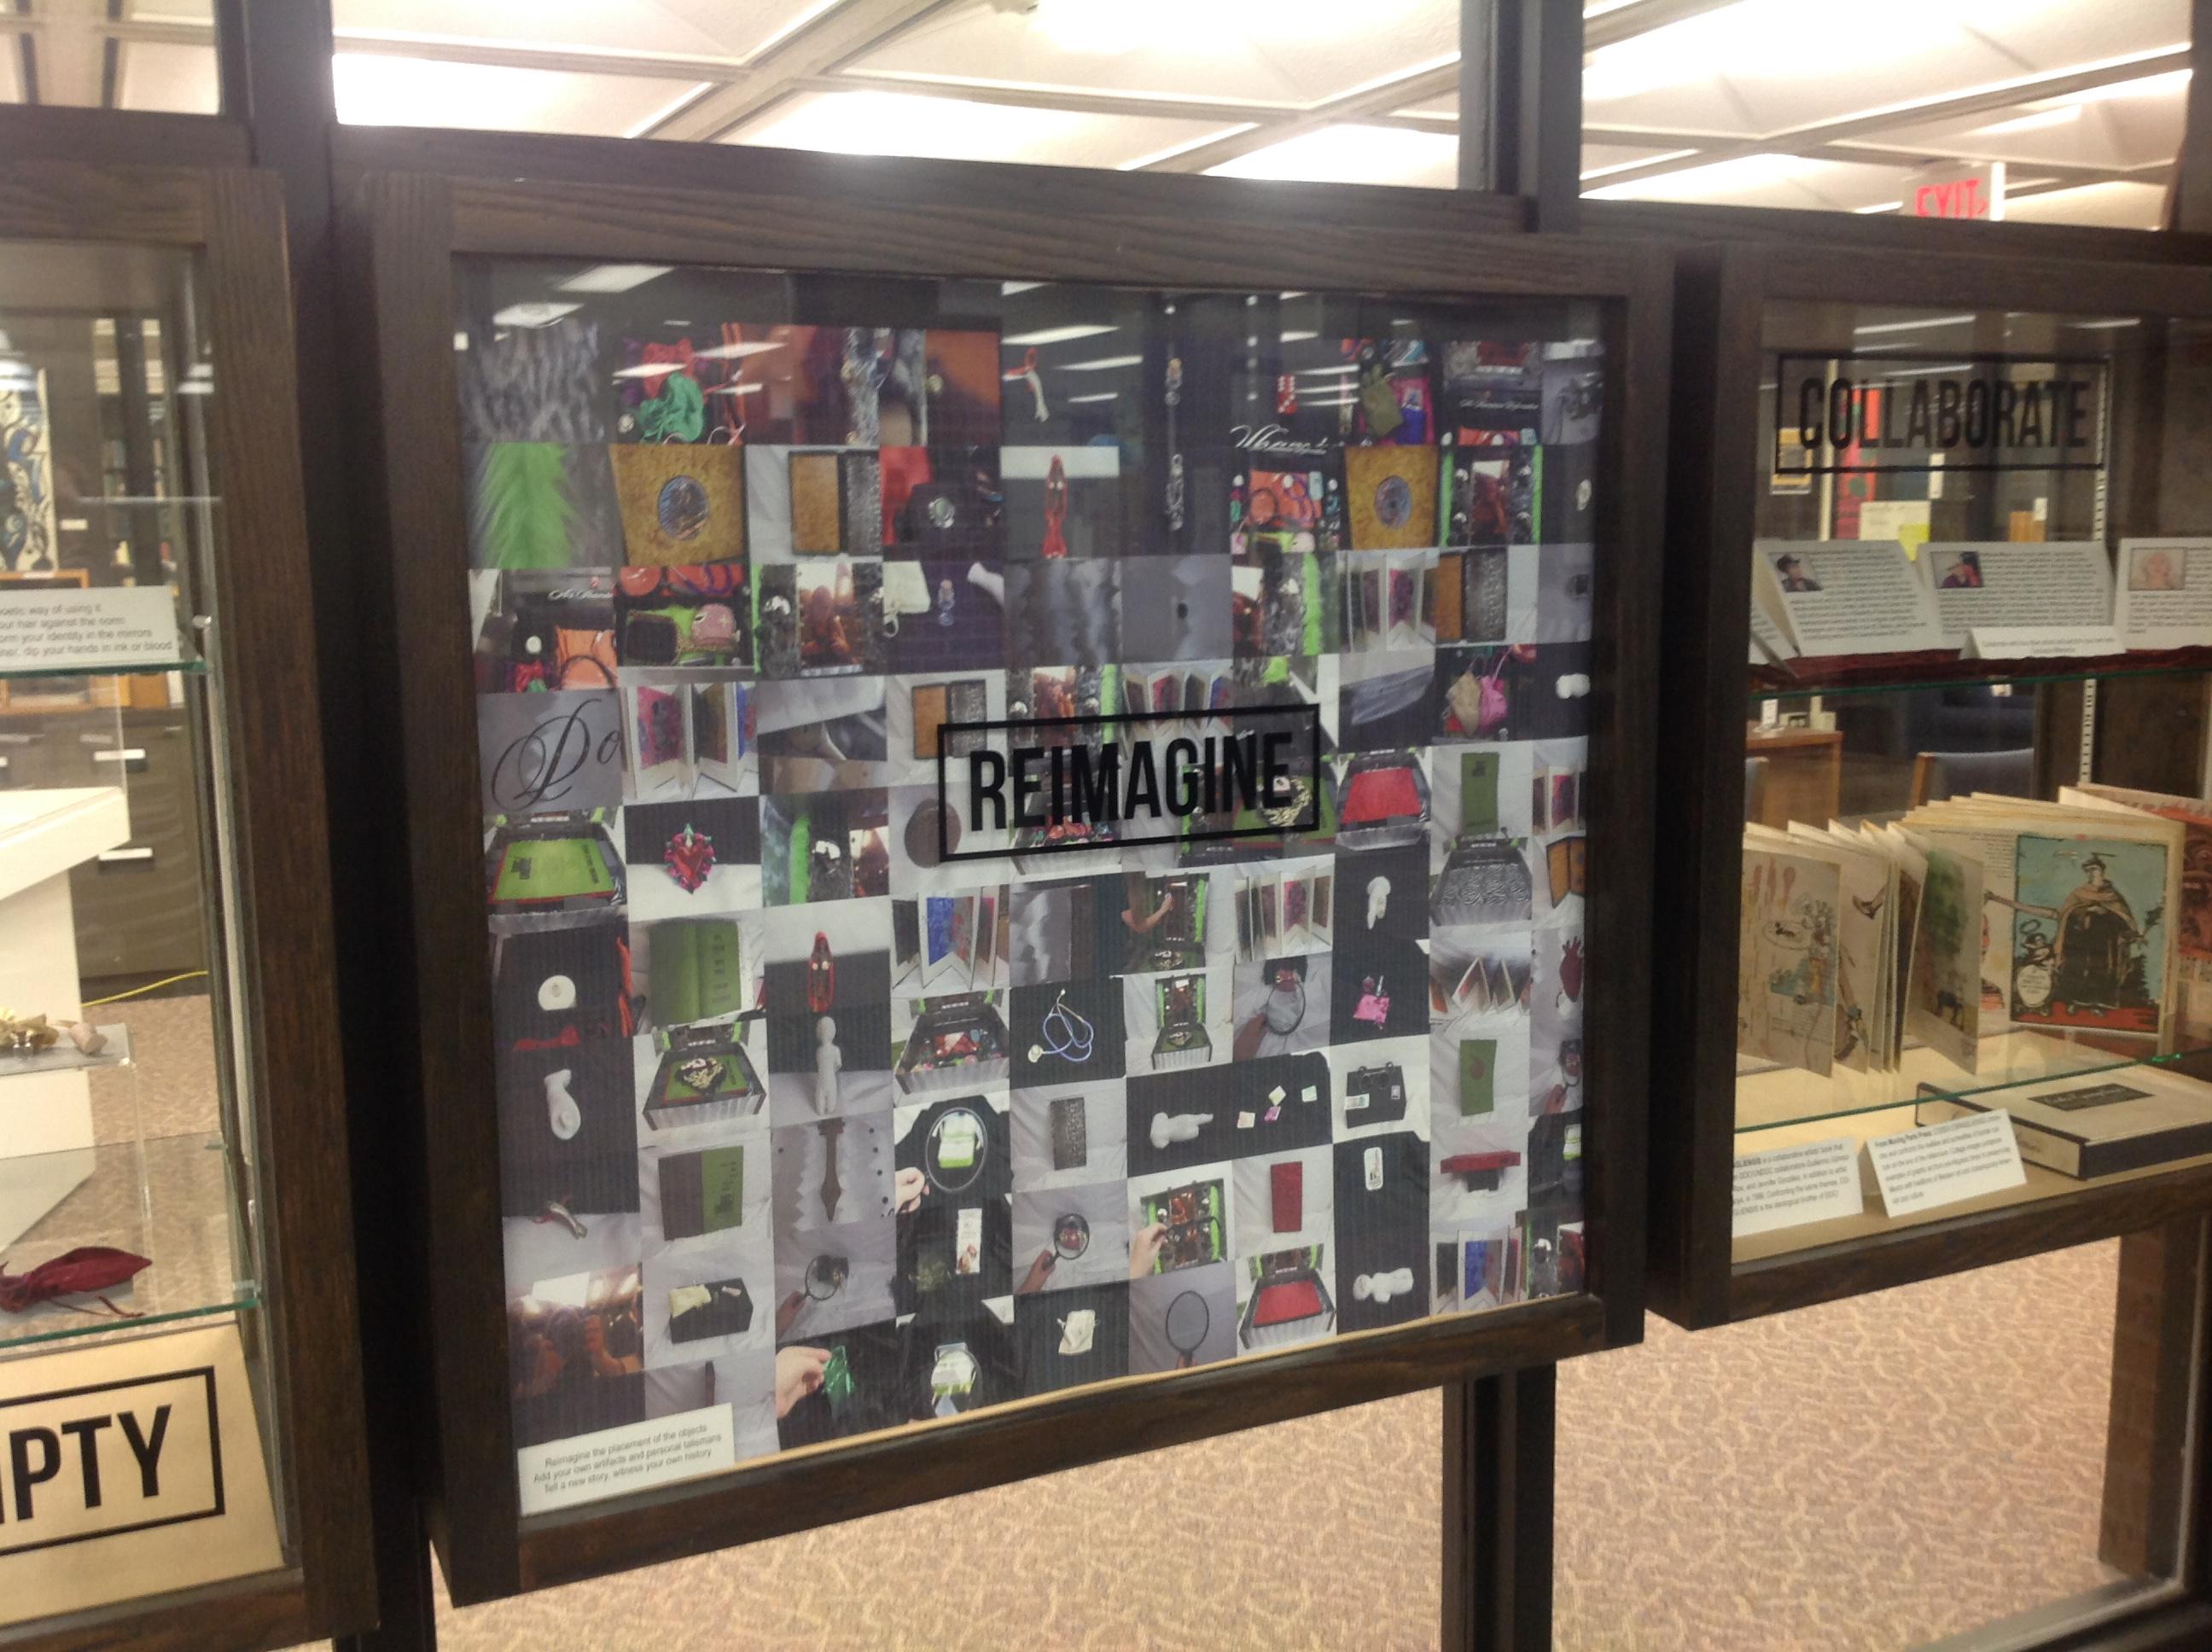 Exhibition case